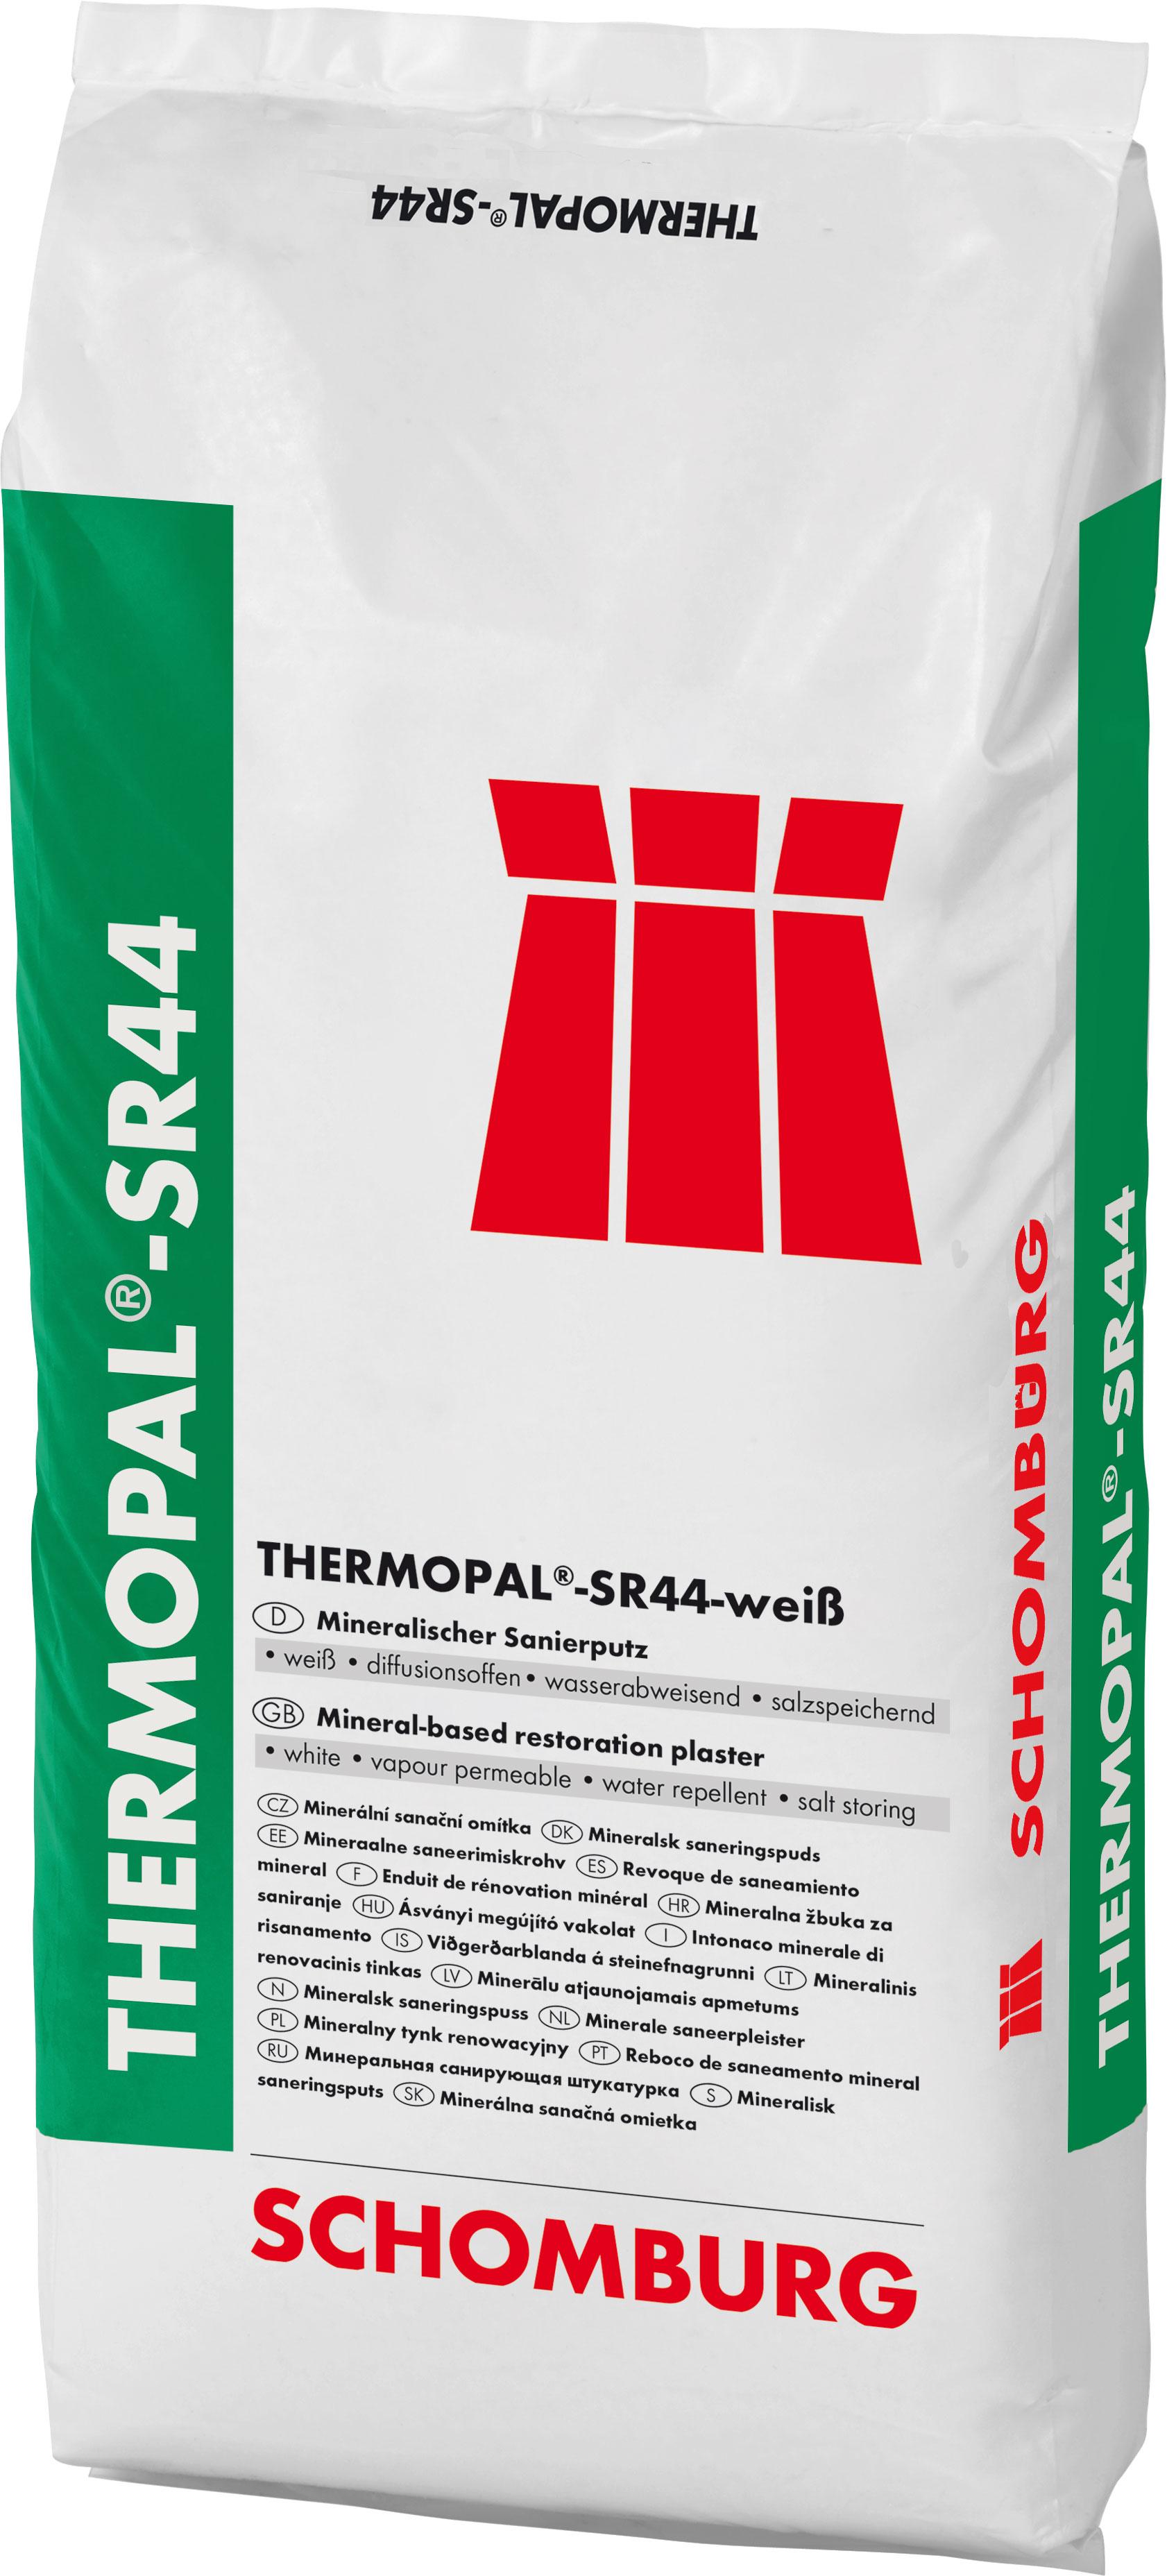 Berühmt THERMOPAL-SR44-weiß | SCHOMBURG CZ54